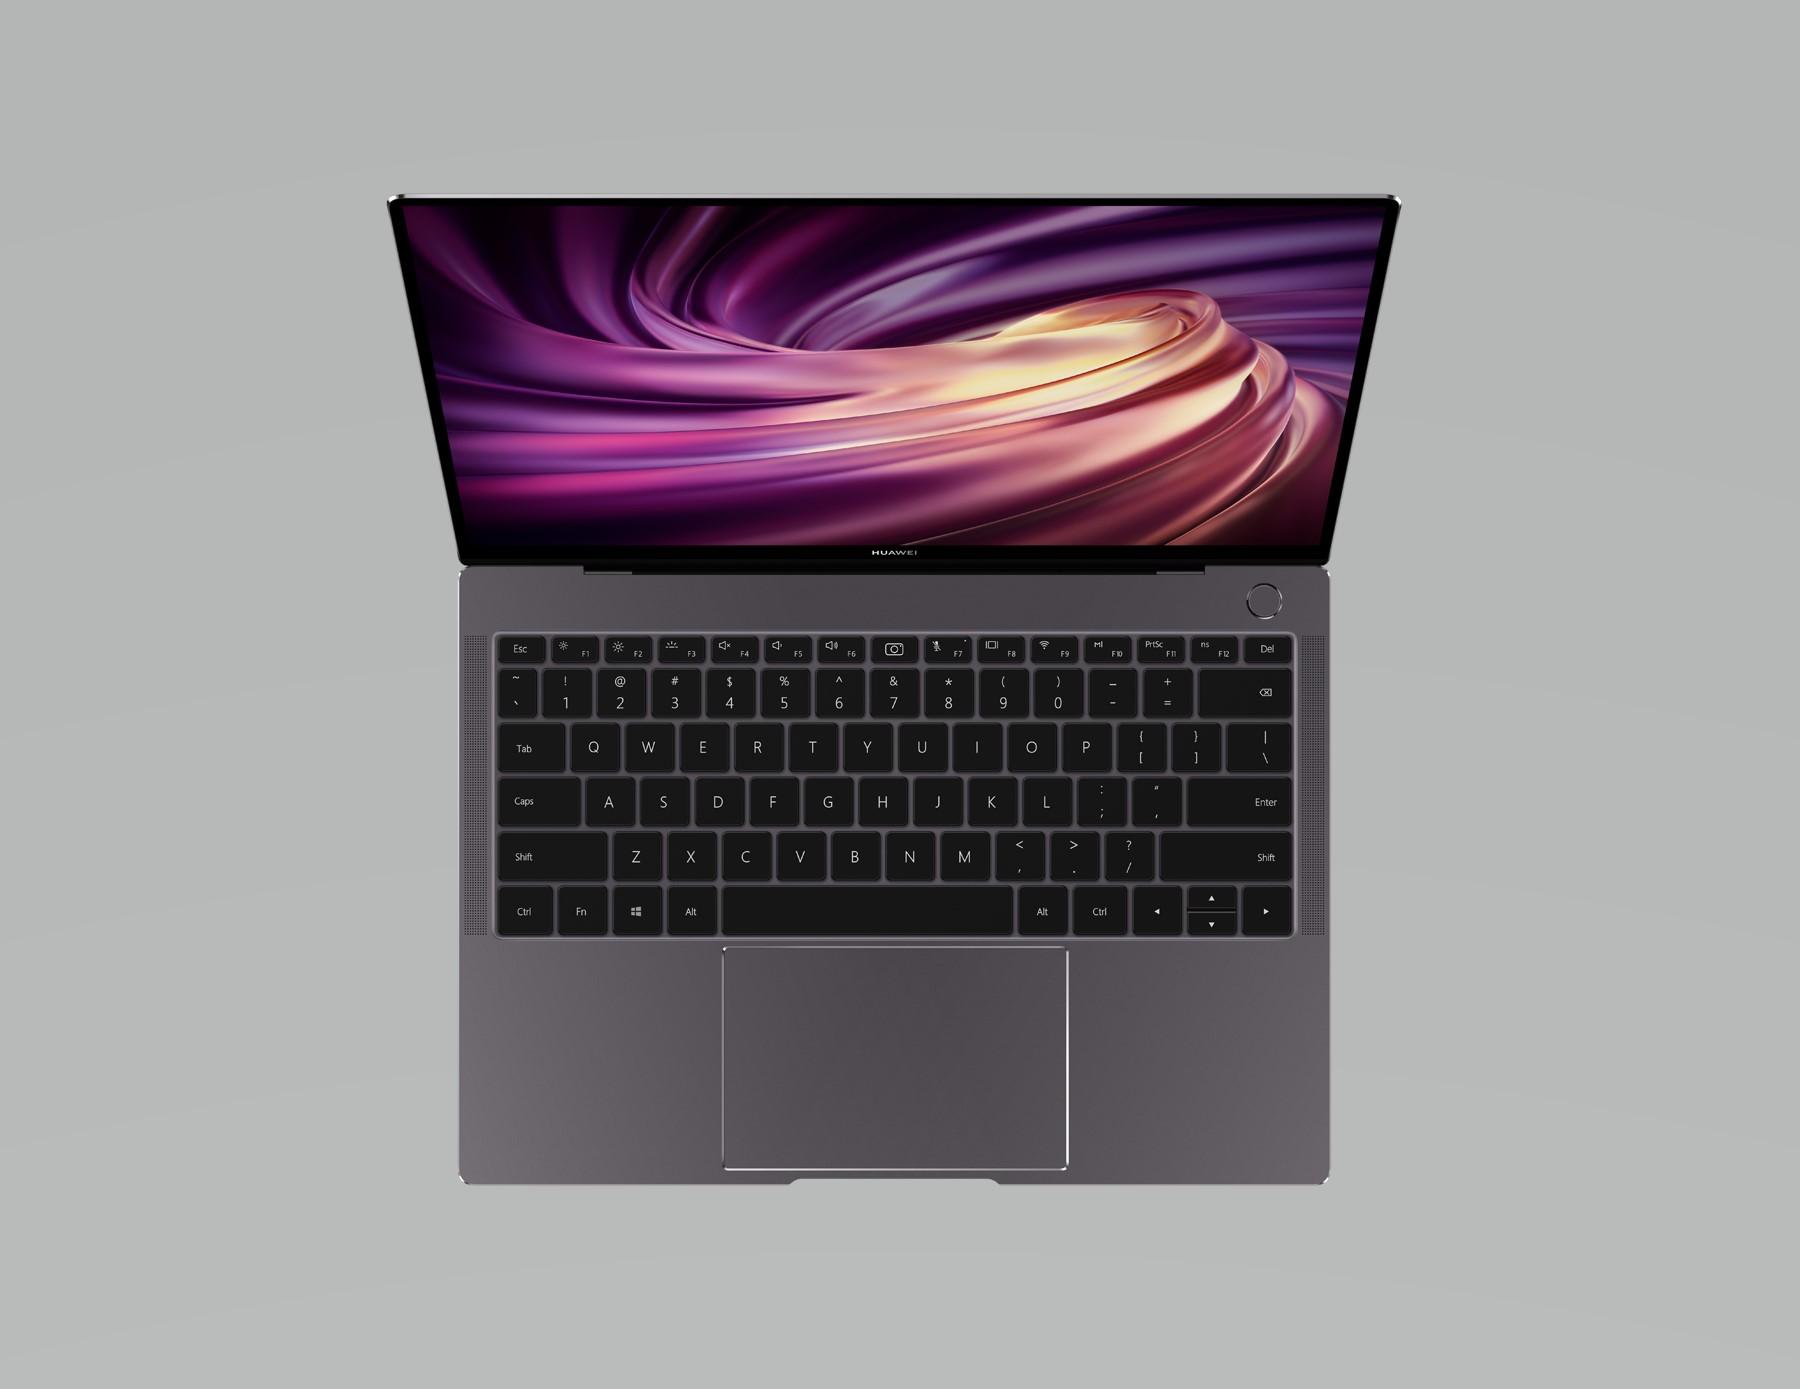 Huawei MateBook X Pro 2019